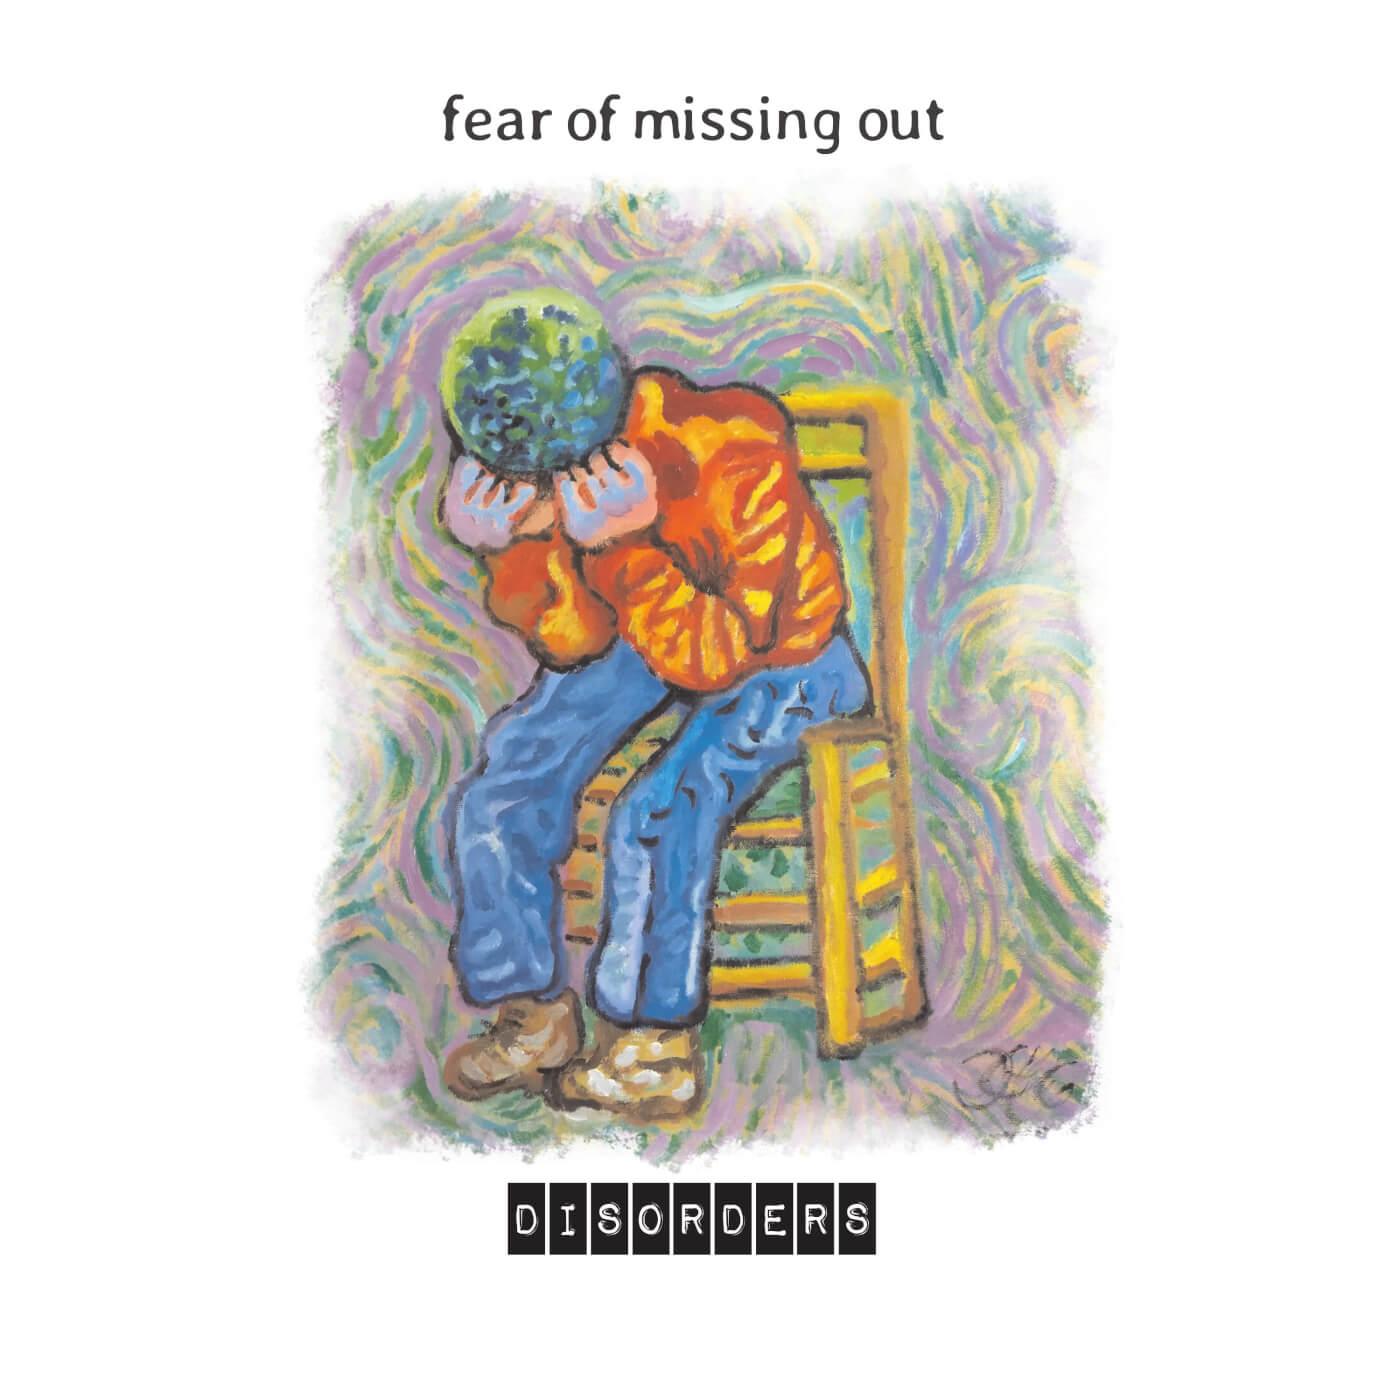 Disorders, album de Fear Of Missing Out a la venta el 4 de septiembre